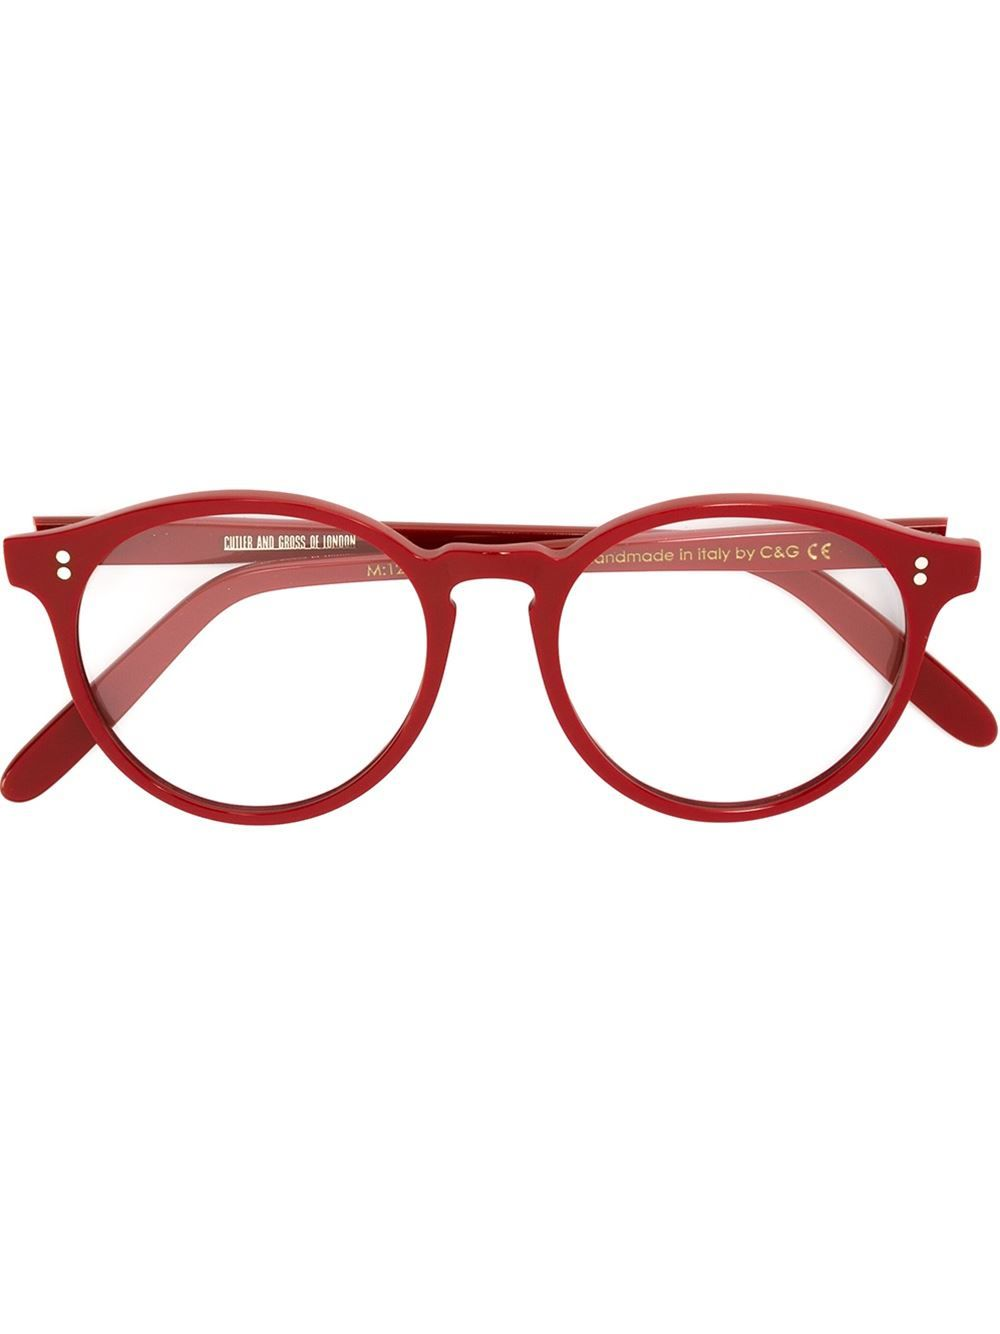 80da2482728 Cutler   Gross round shaped glasses